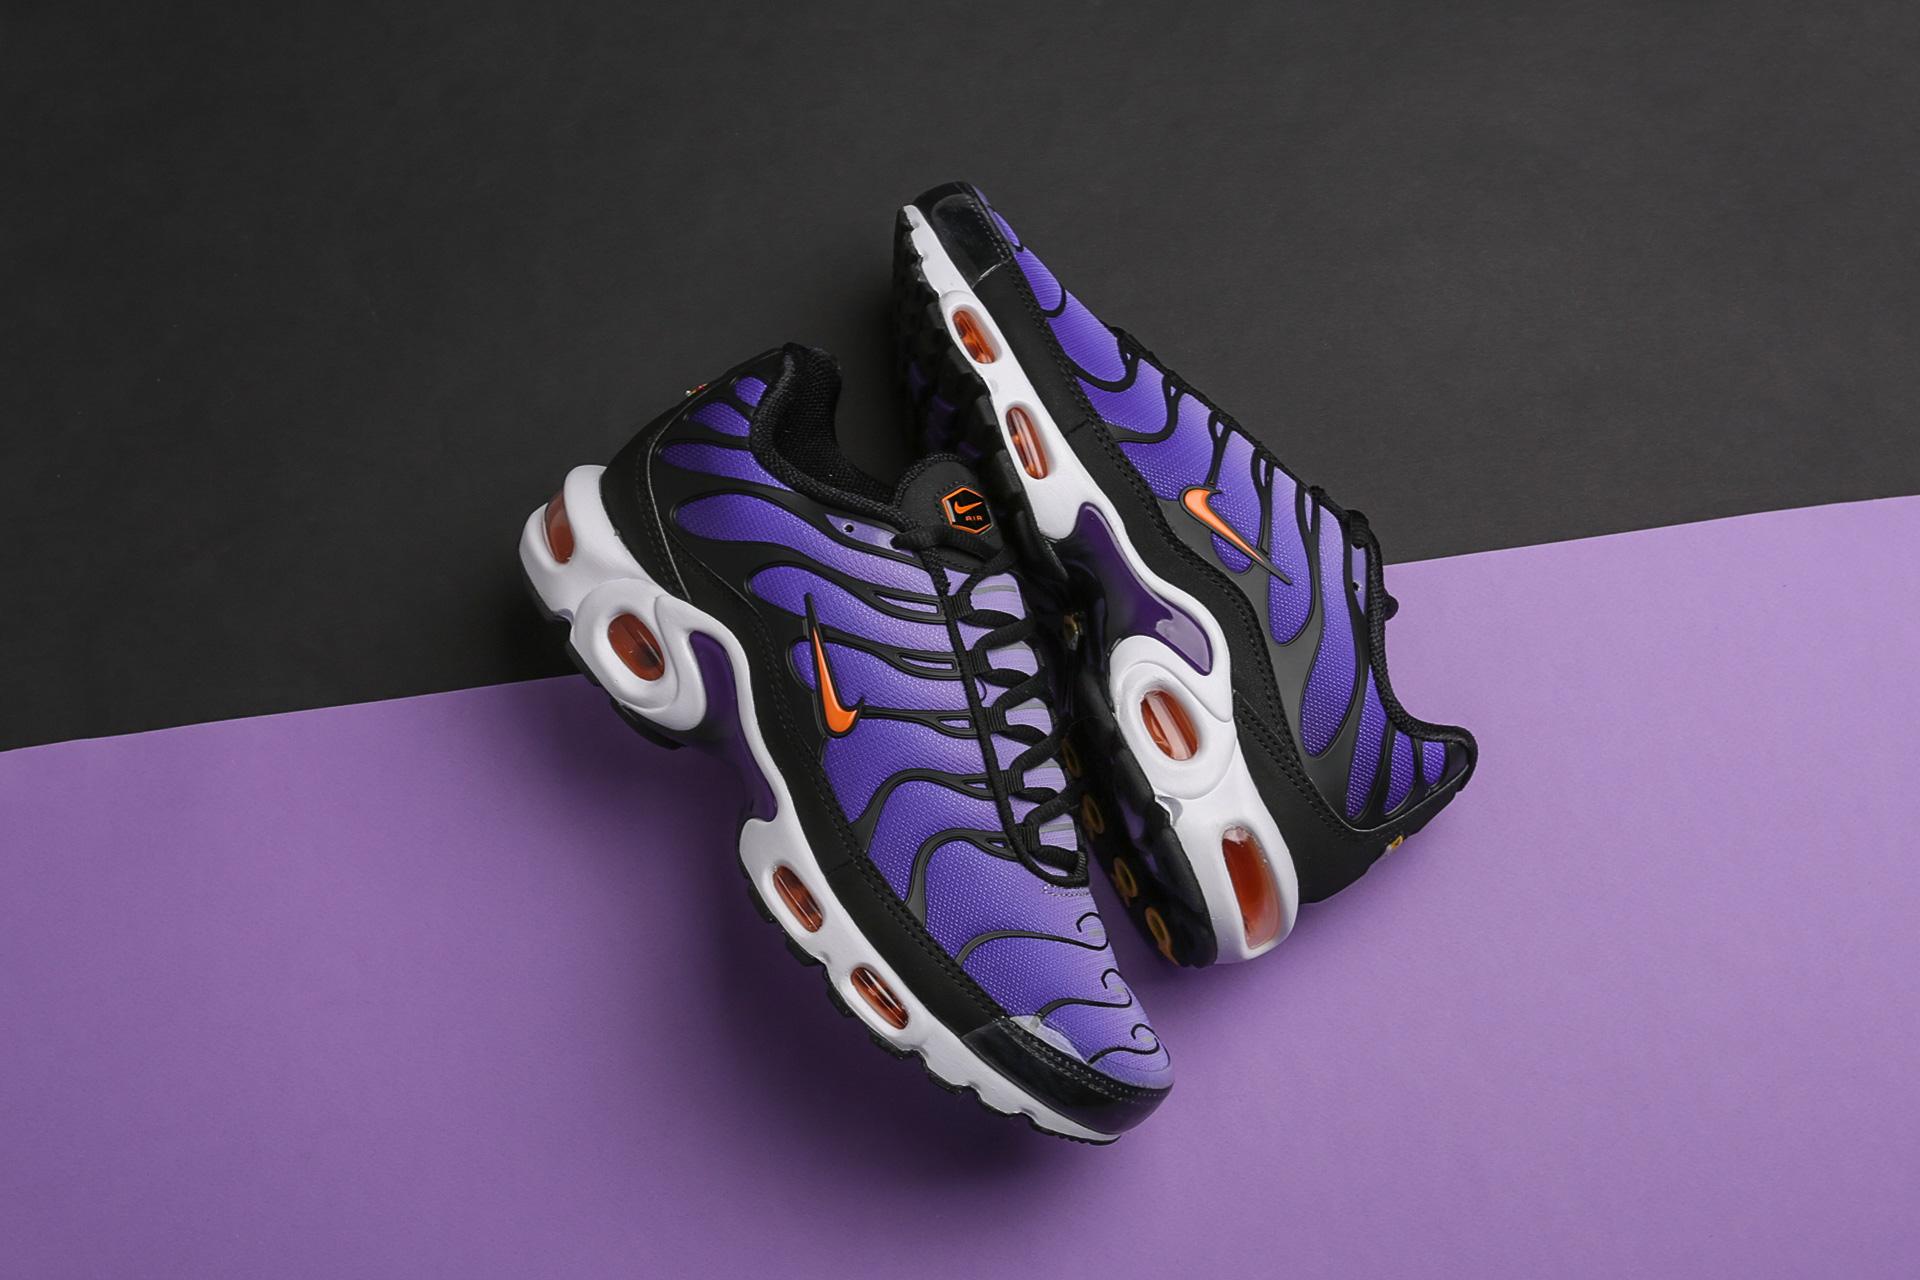 2ec27d9f88a8f9 Купить фиолетовые мужские кроссовки Air Max Plus OG от Nike (BQ4629 ...